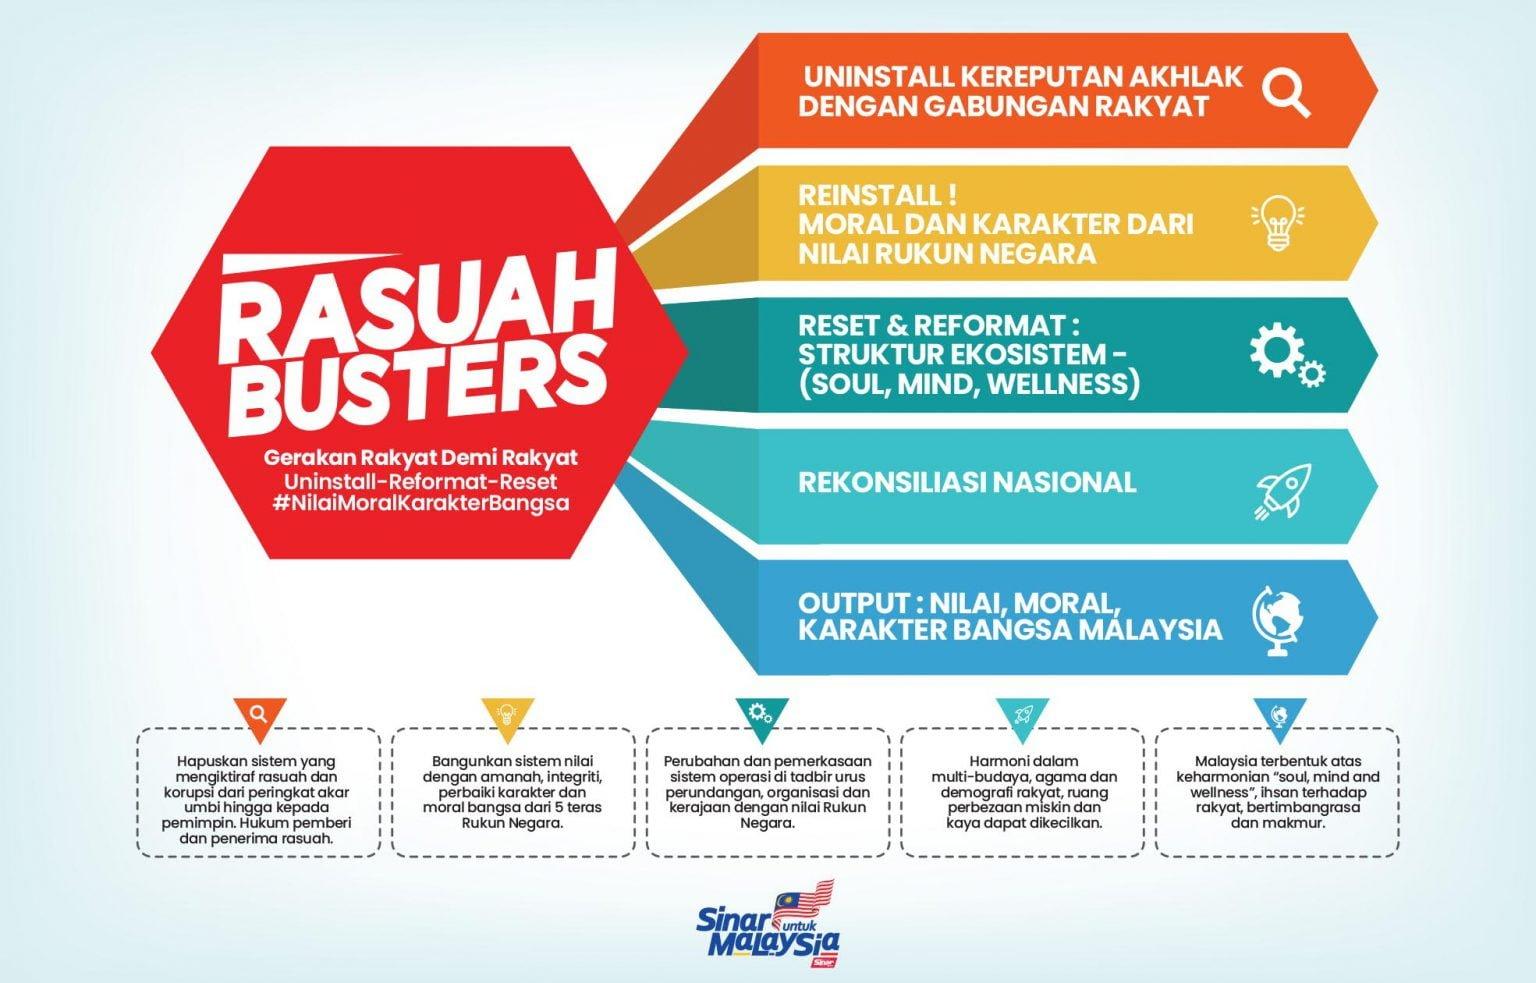 #RasuahBusters 和200盟友推展反贪腐运动